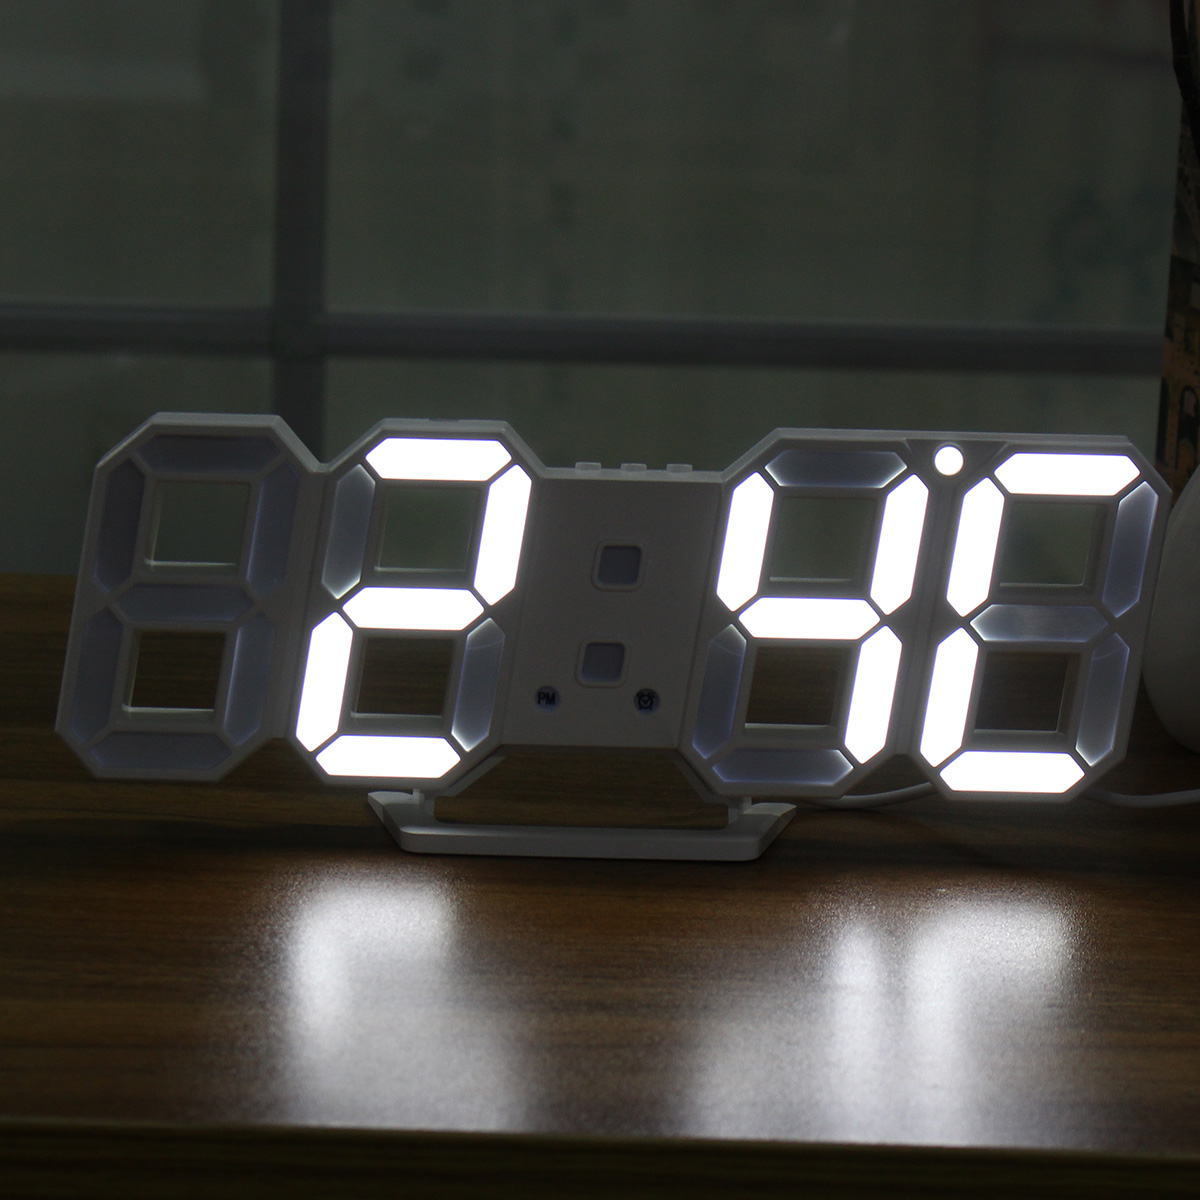 Large modern digital led skeleton wall clock timer 2412 hour 2959d38e f8e5 420b 9ba2 72a98feef88d amipublicfo Choice Image